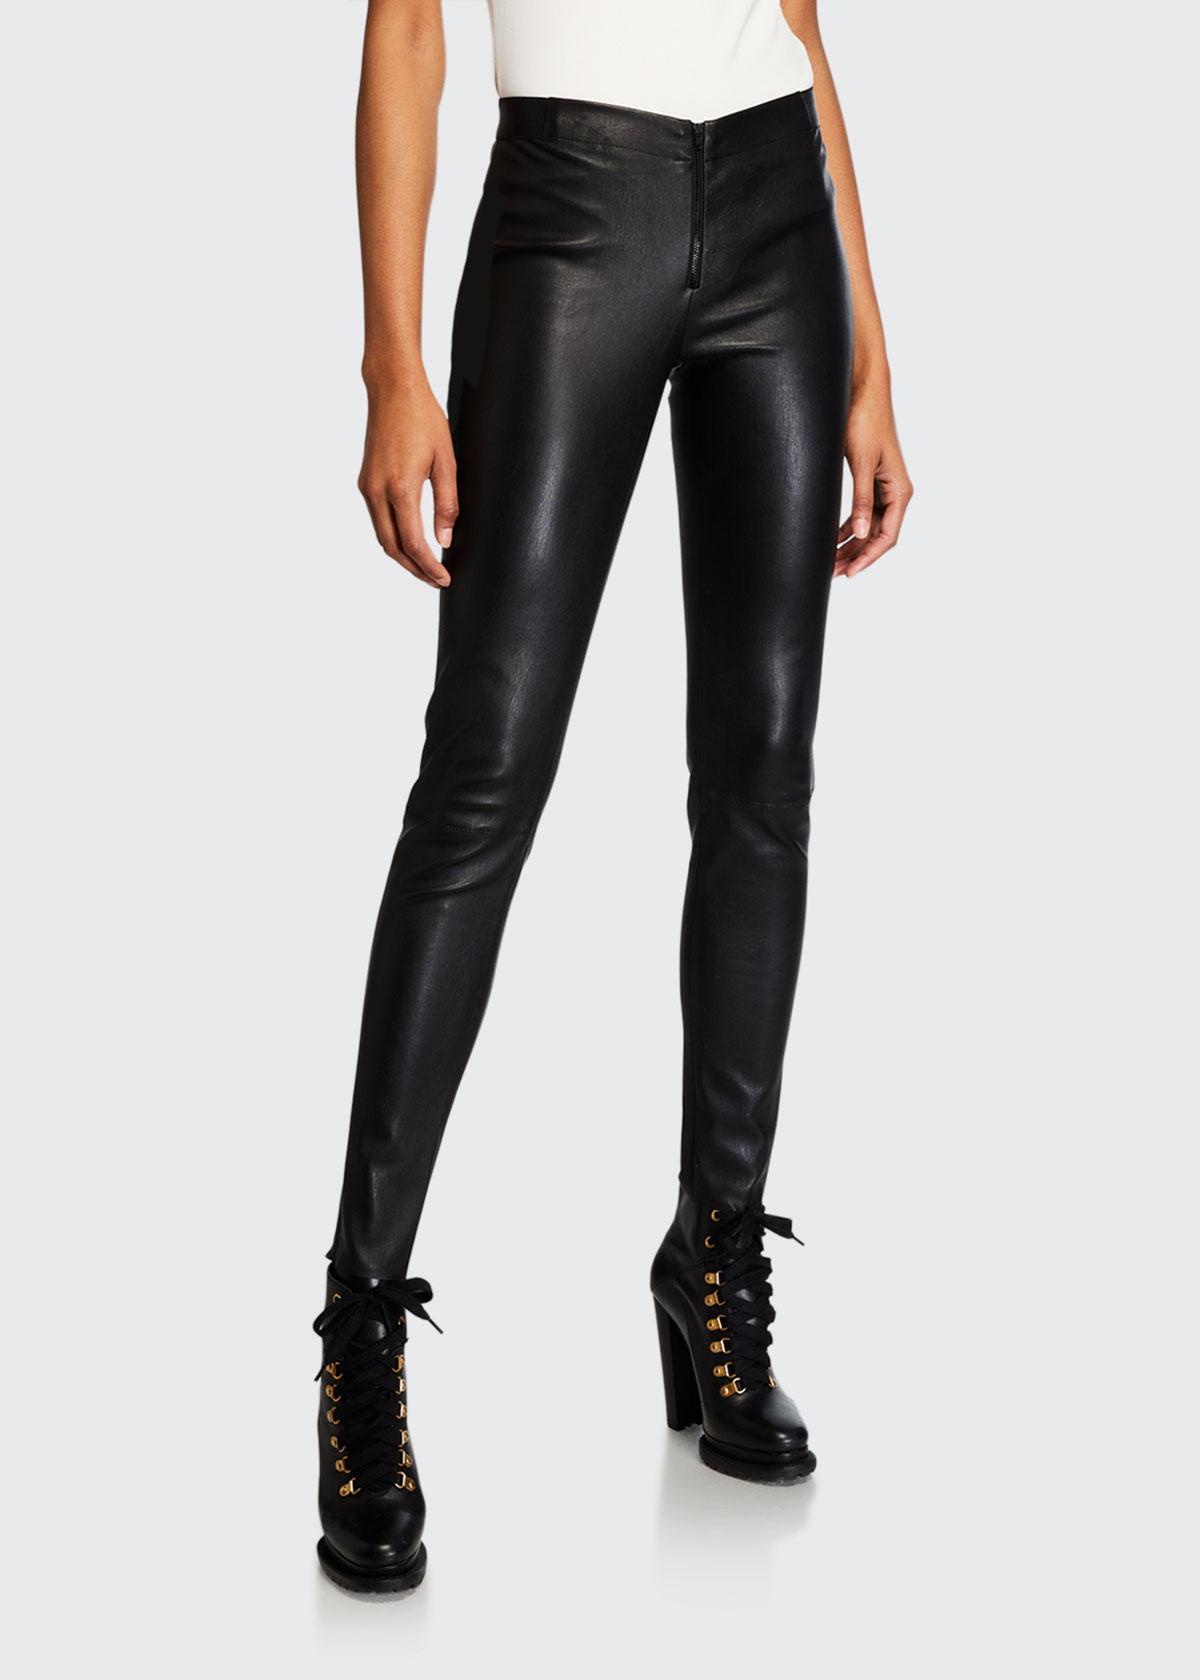 Alice + Olivia Lamb Leather Leggings, Size: 2, Black